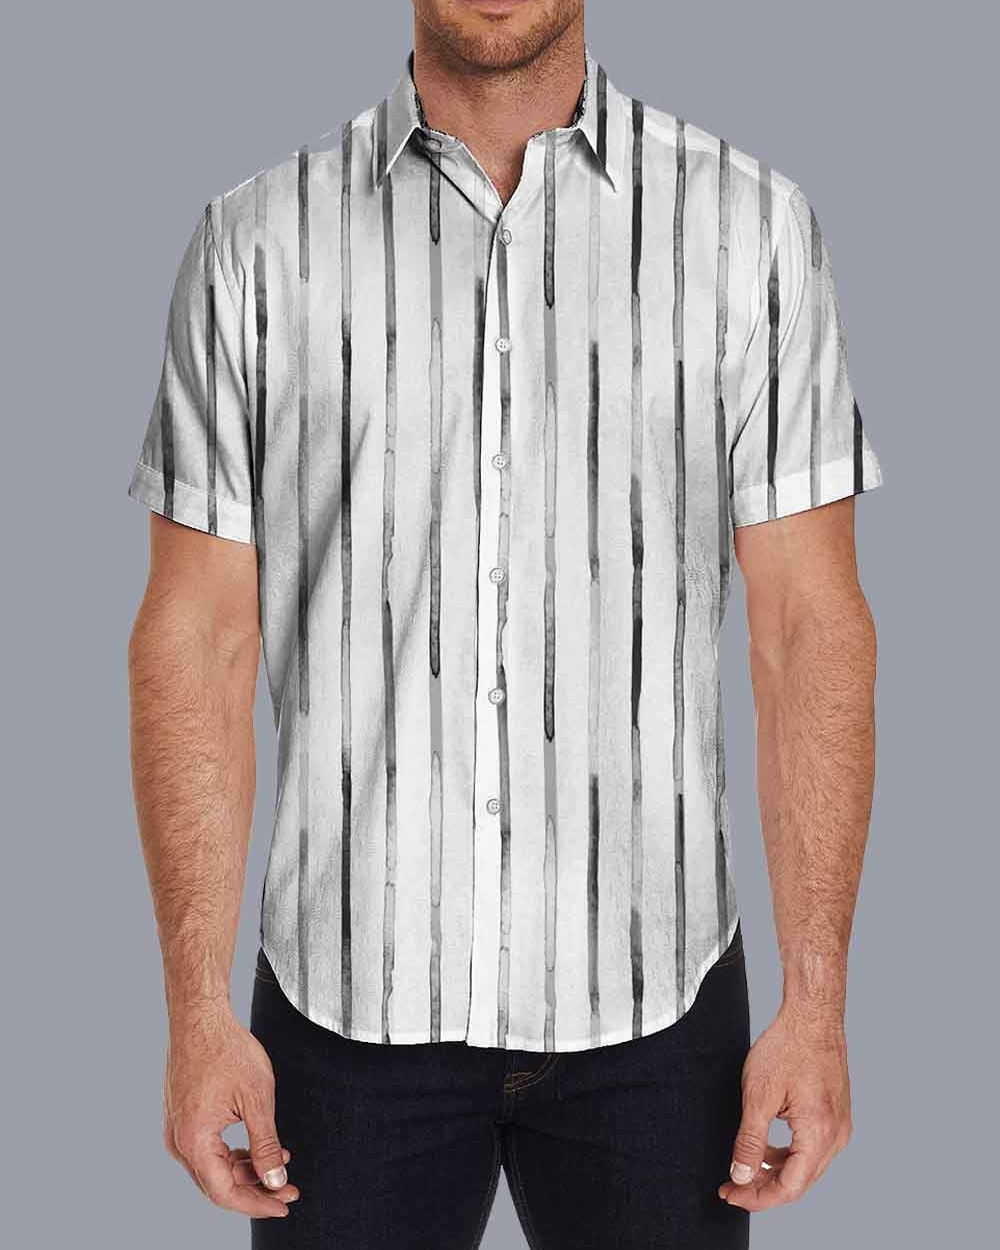 junctionstore|ravirajoria/mensshirt/grey